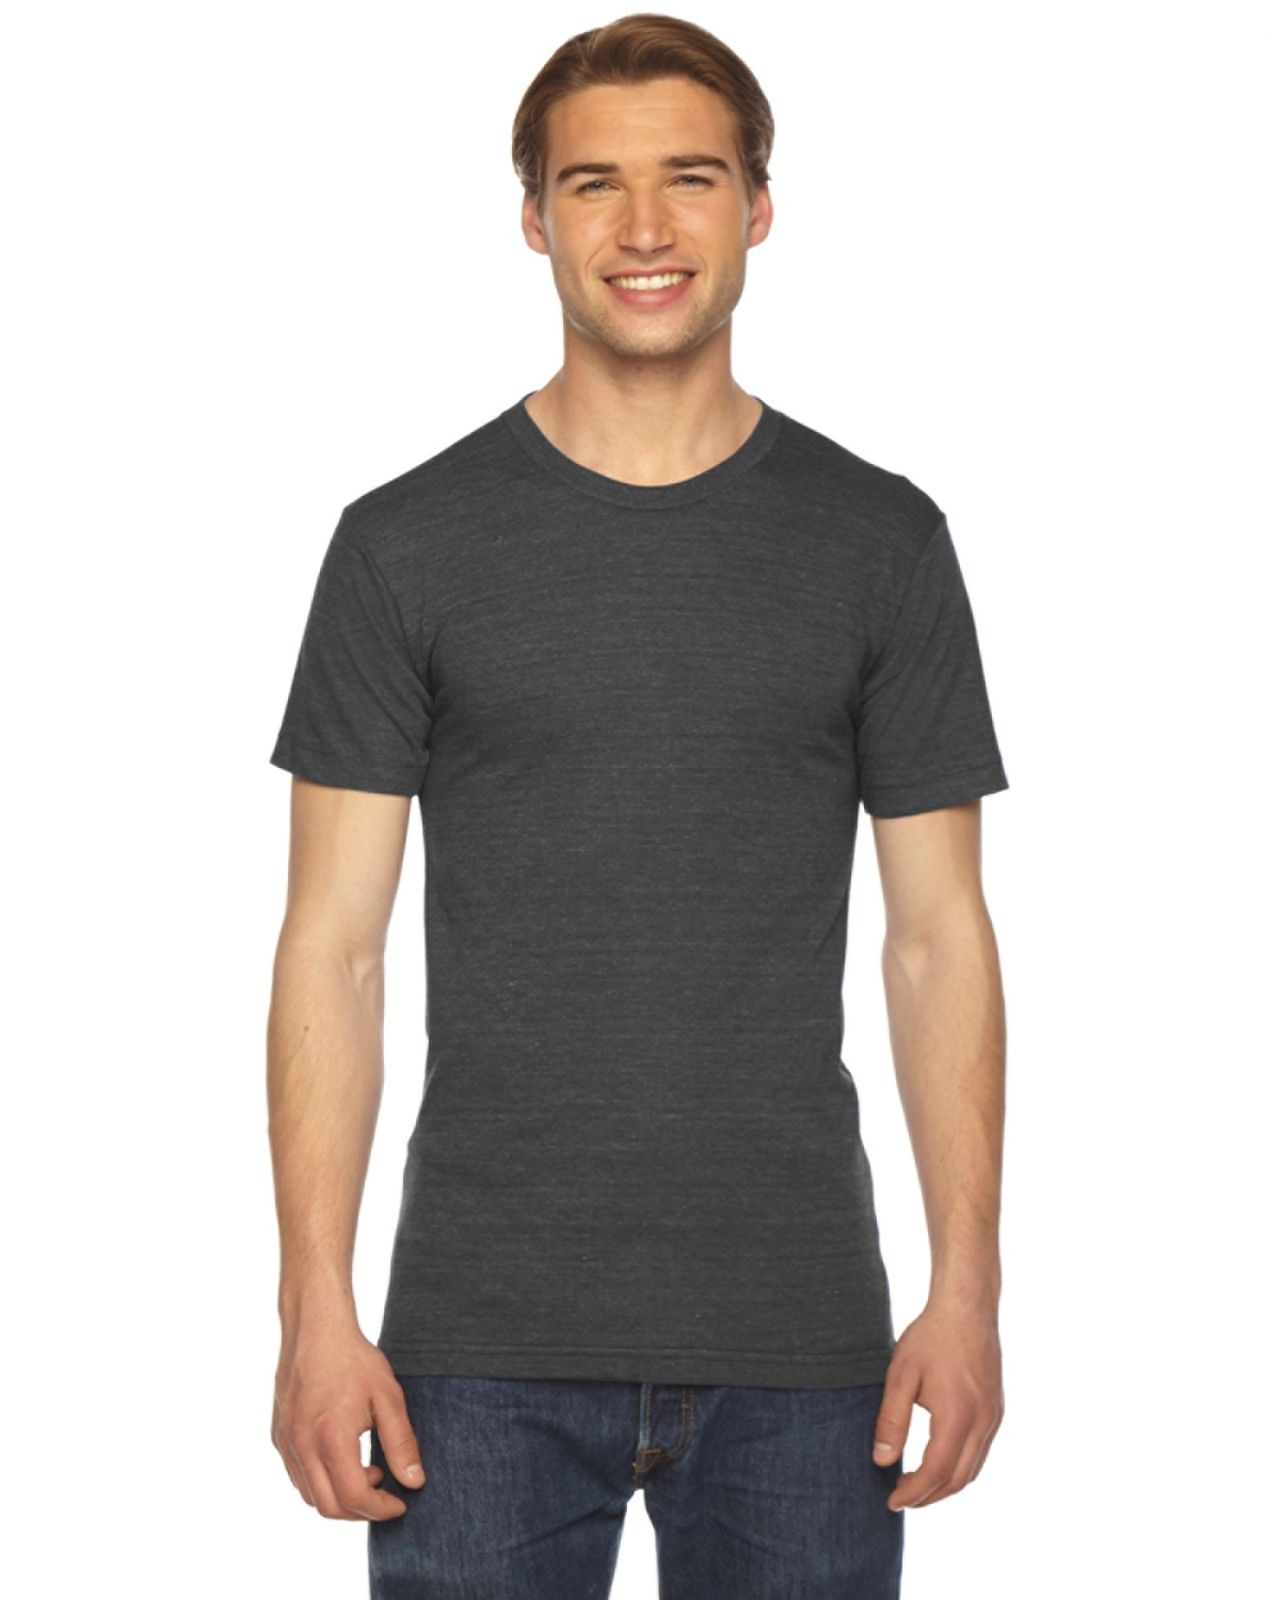 American Apparel Tr401 Tri Blend T Shirt Vintage Style